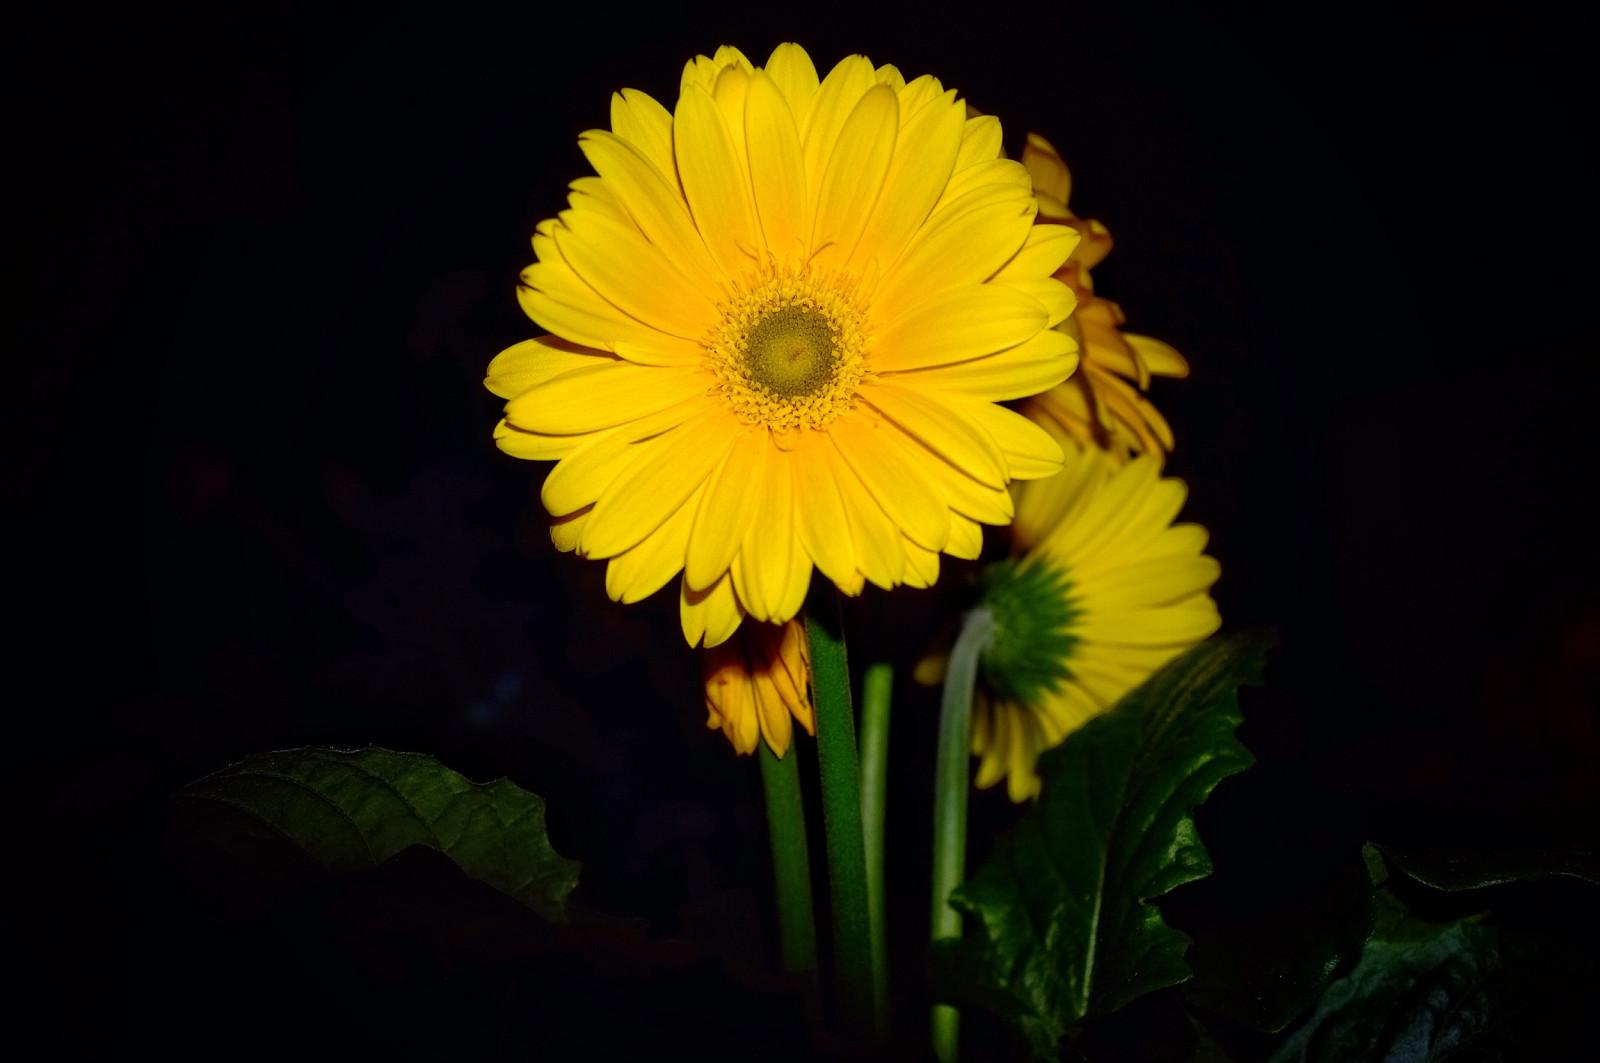 Wallpaper Nature Yellow Camera HDR IPad Fujifilm ART Light Color Flower Cool Beauty Flora Colour Colours Fuji Petal Interesting X100